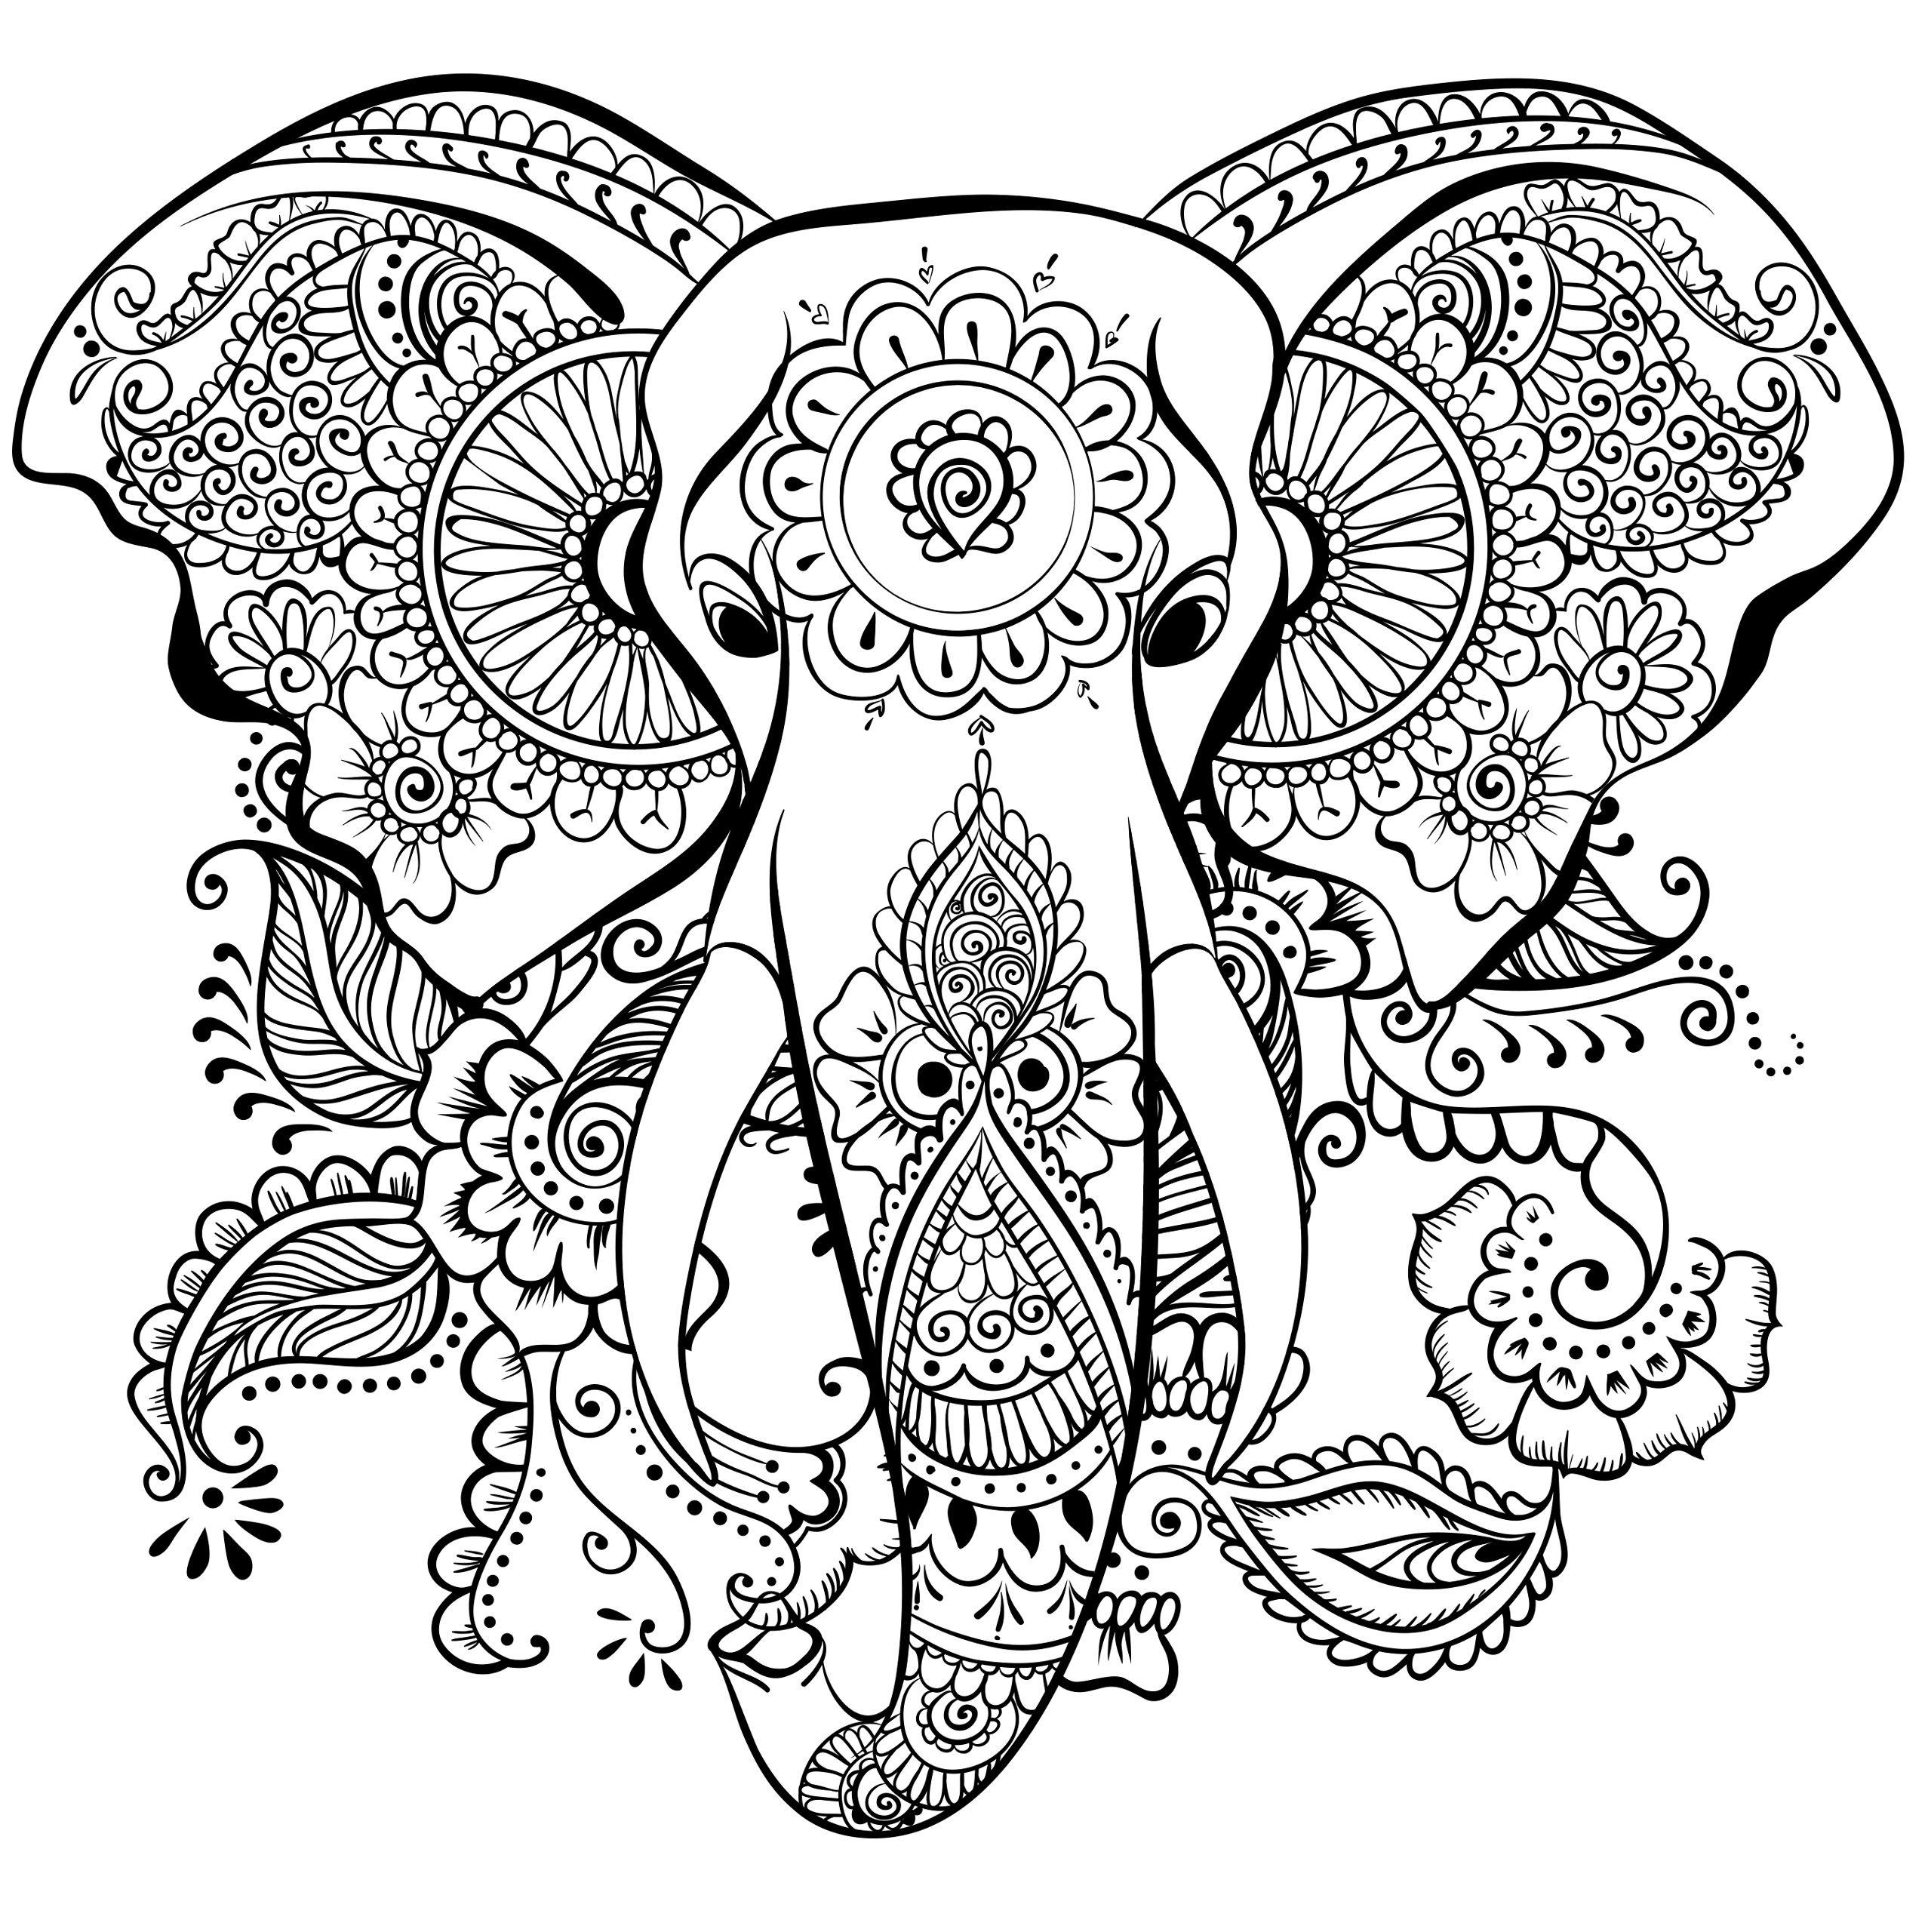 Take a look at mandalas coloriage mandala coloriage elephant coloriage - Coloriage mandale ...